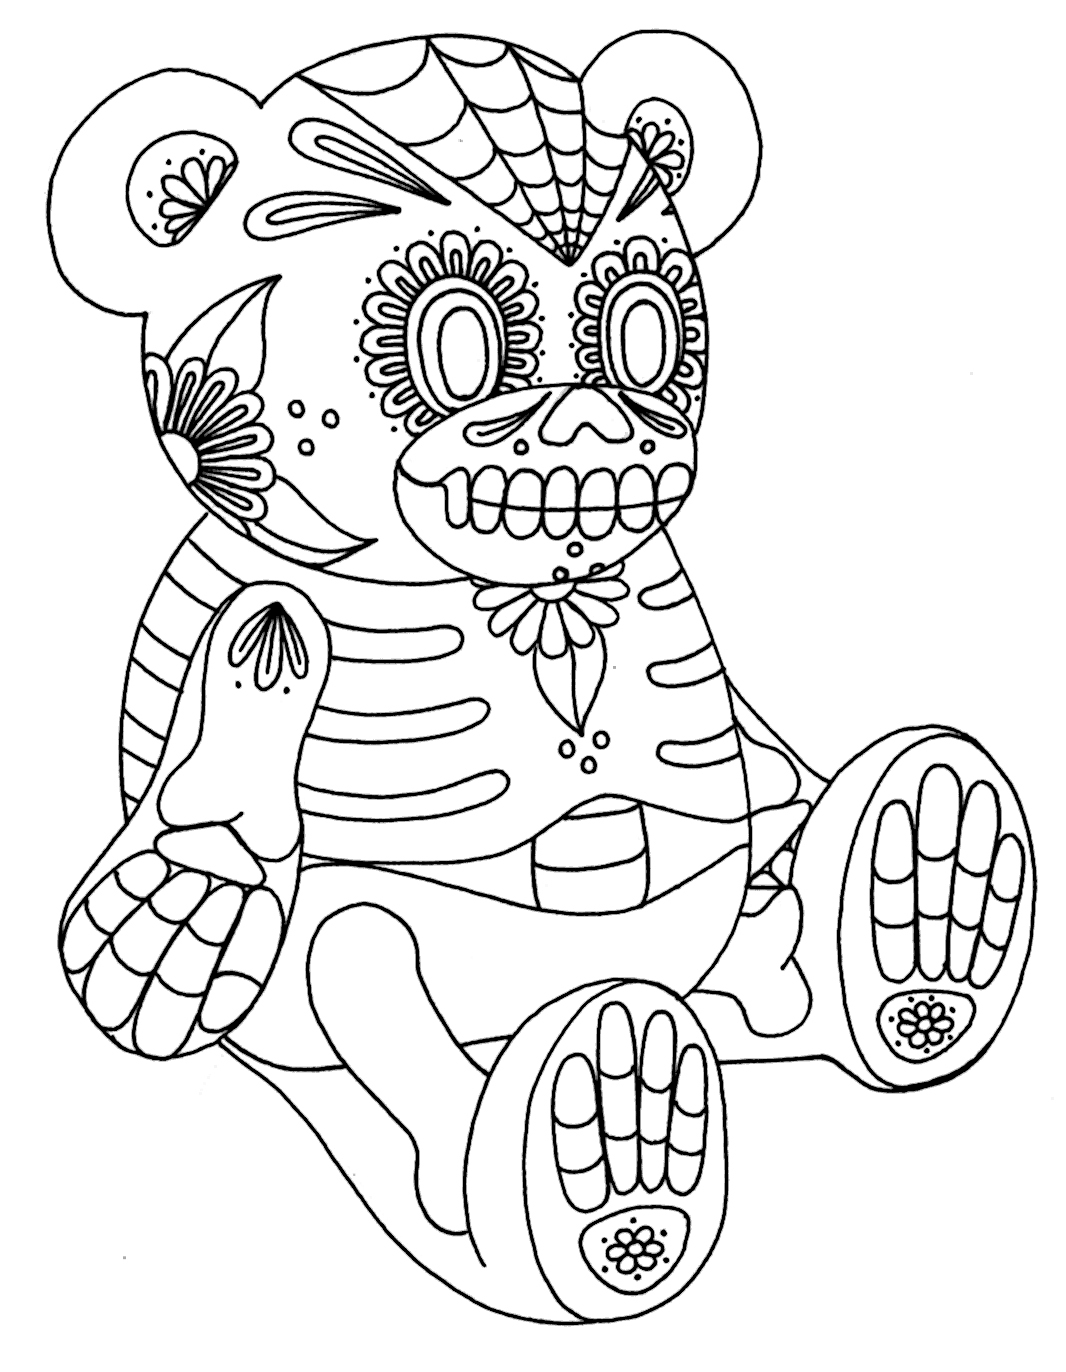 colored sugar skulls sugar skull coloring pages best coloring pages for kids skulls colored sugar